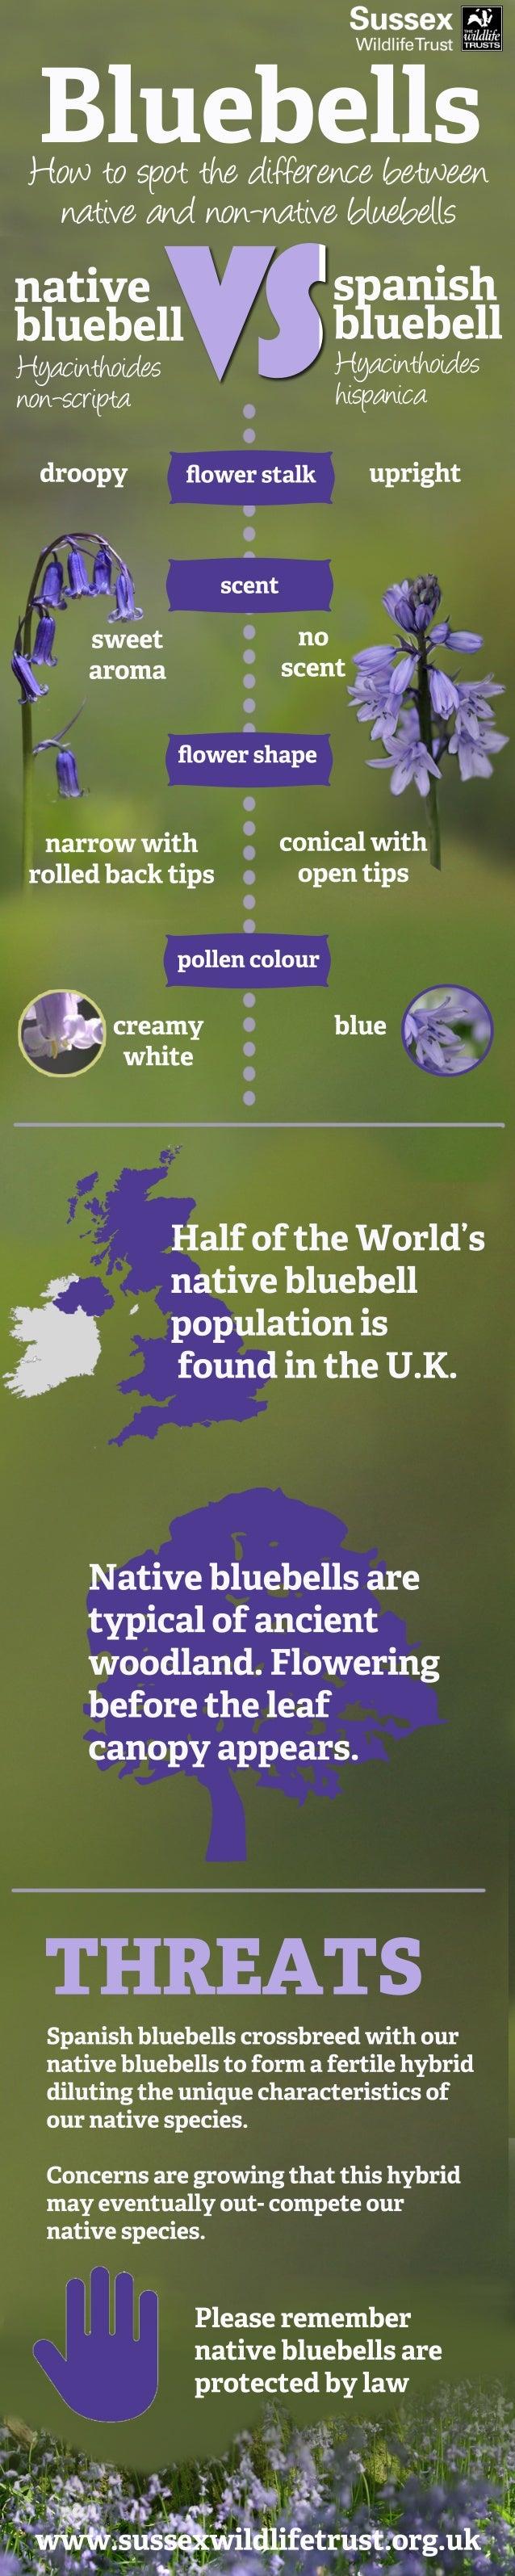 www.sussexwildlifetrust.org.uk BluebellsHowtospotthedifferencebetween nativeandnon-nativebluebells upright scent droopy cr...